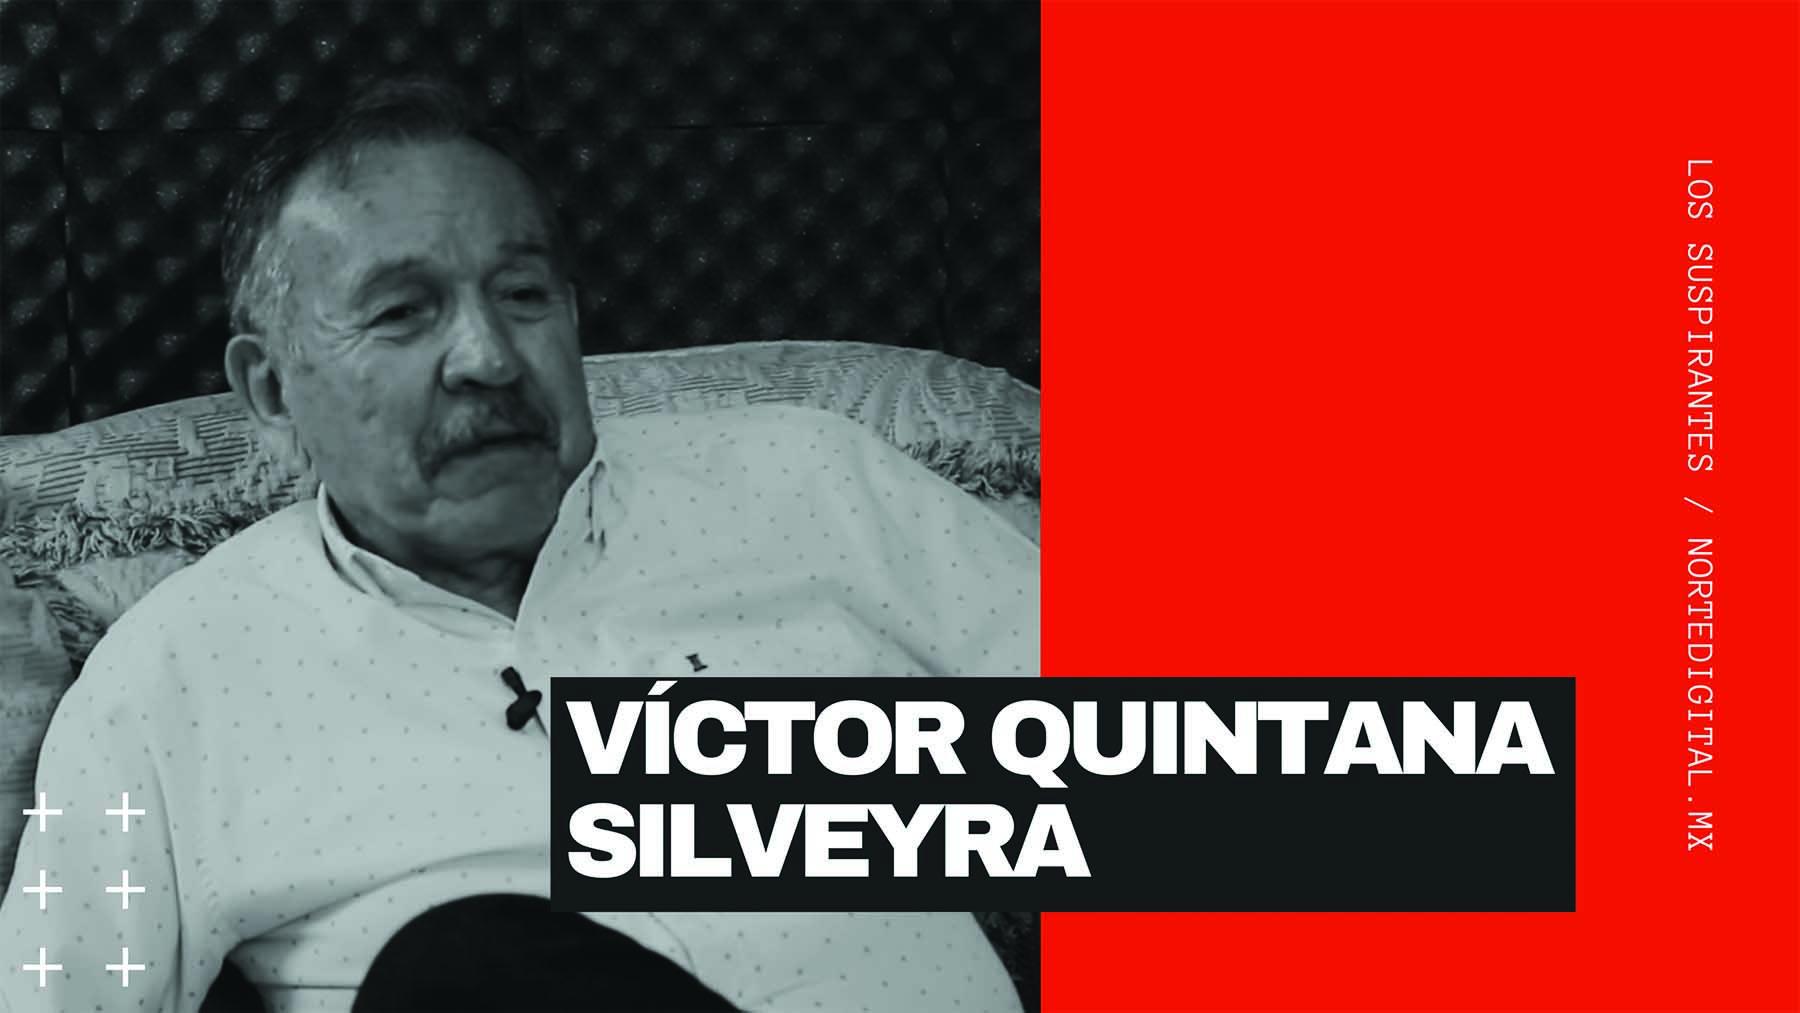 Víctor Quintana